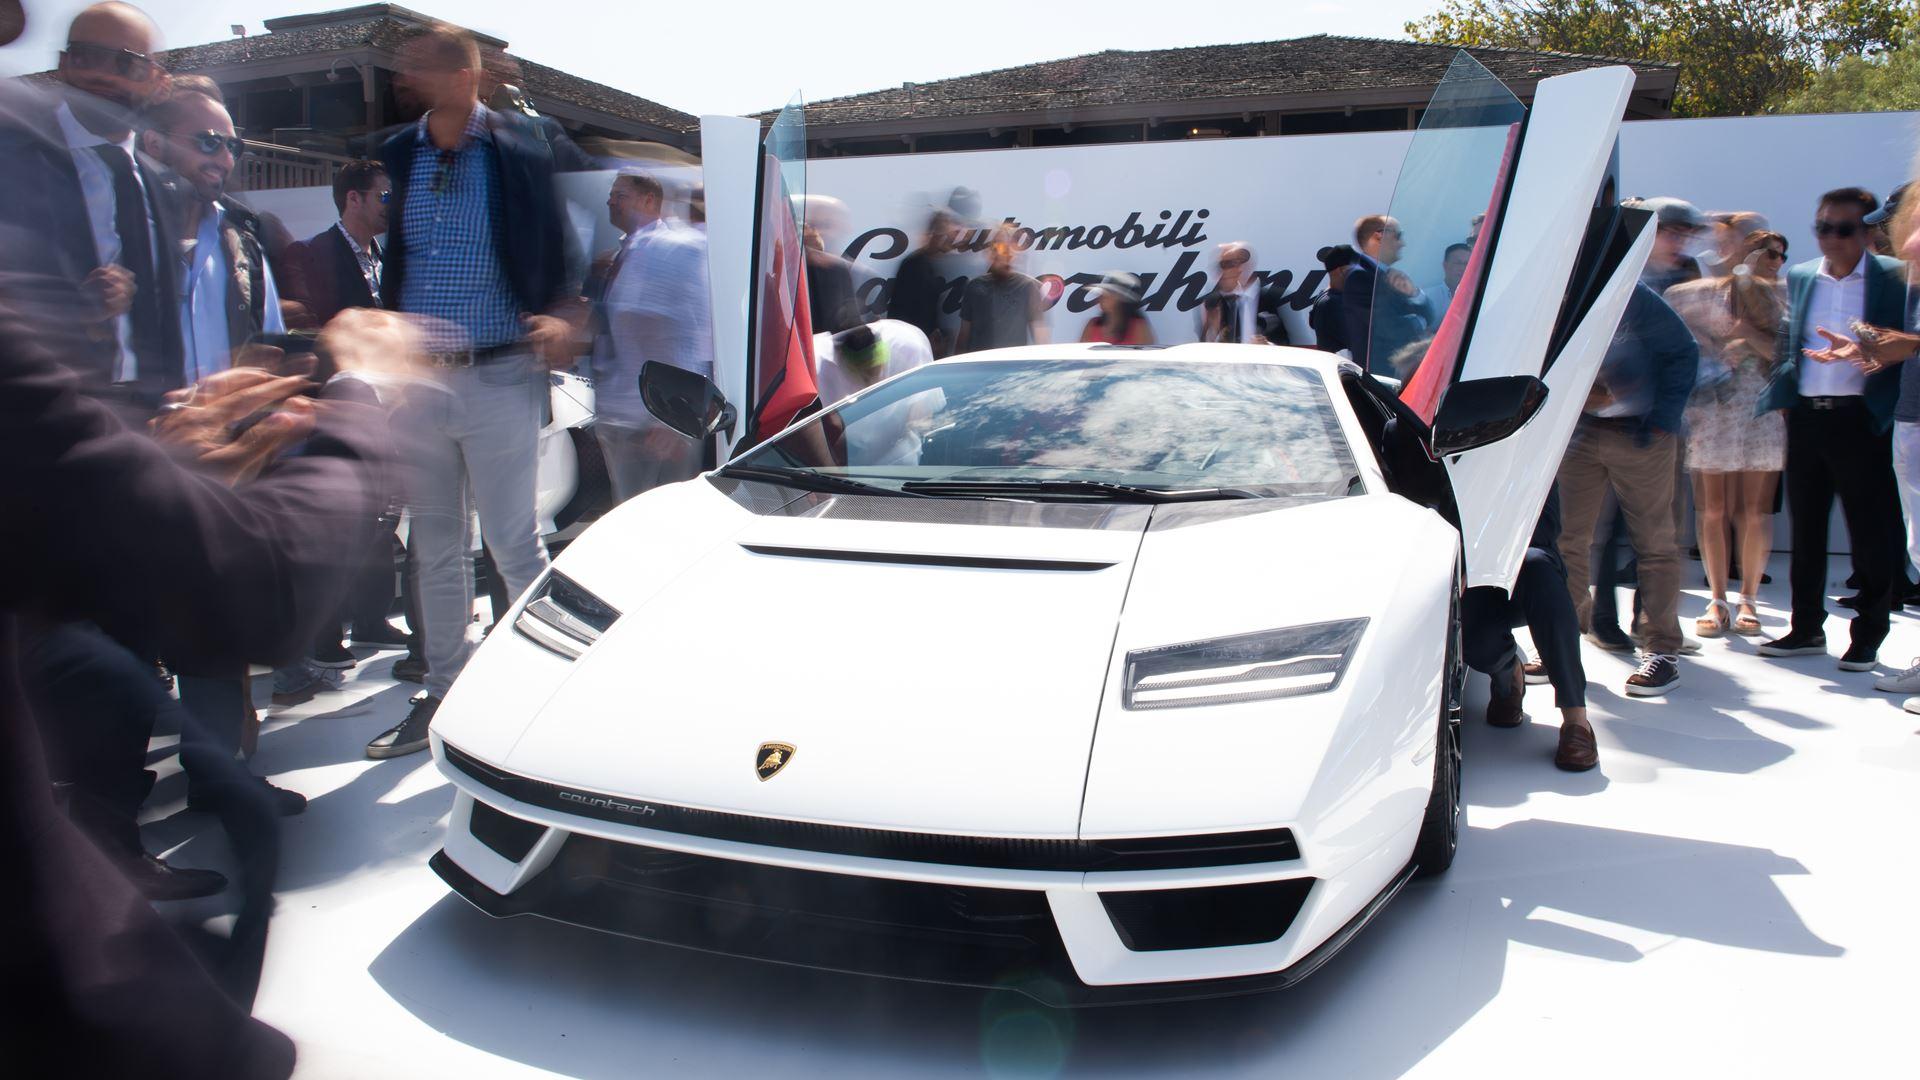 Lamborghini Kicks Off Monterey Car Week with Countach LPI 800-4 Global Debut at The Quail, A Motorsports Gathering - Image 6